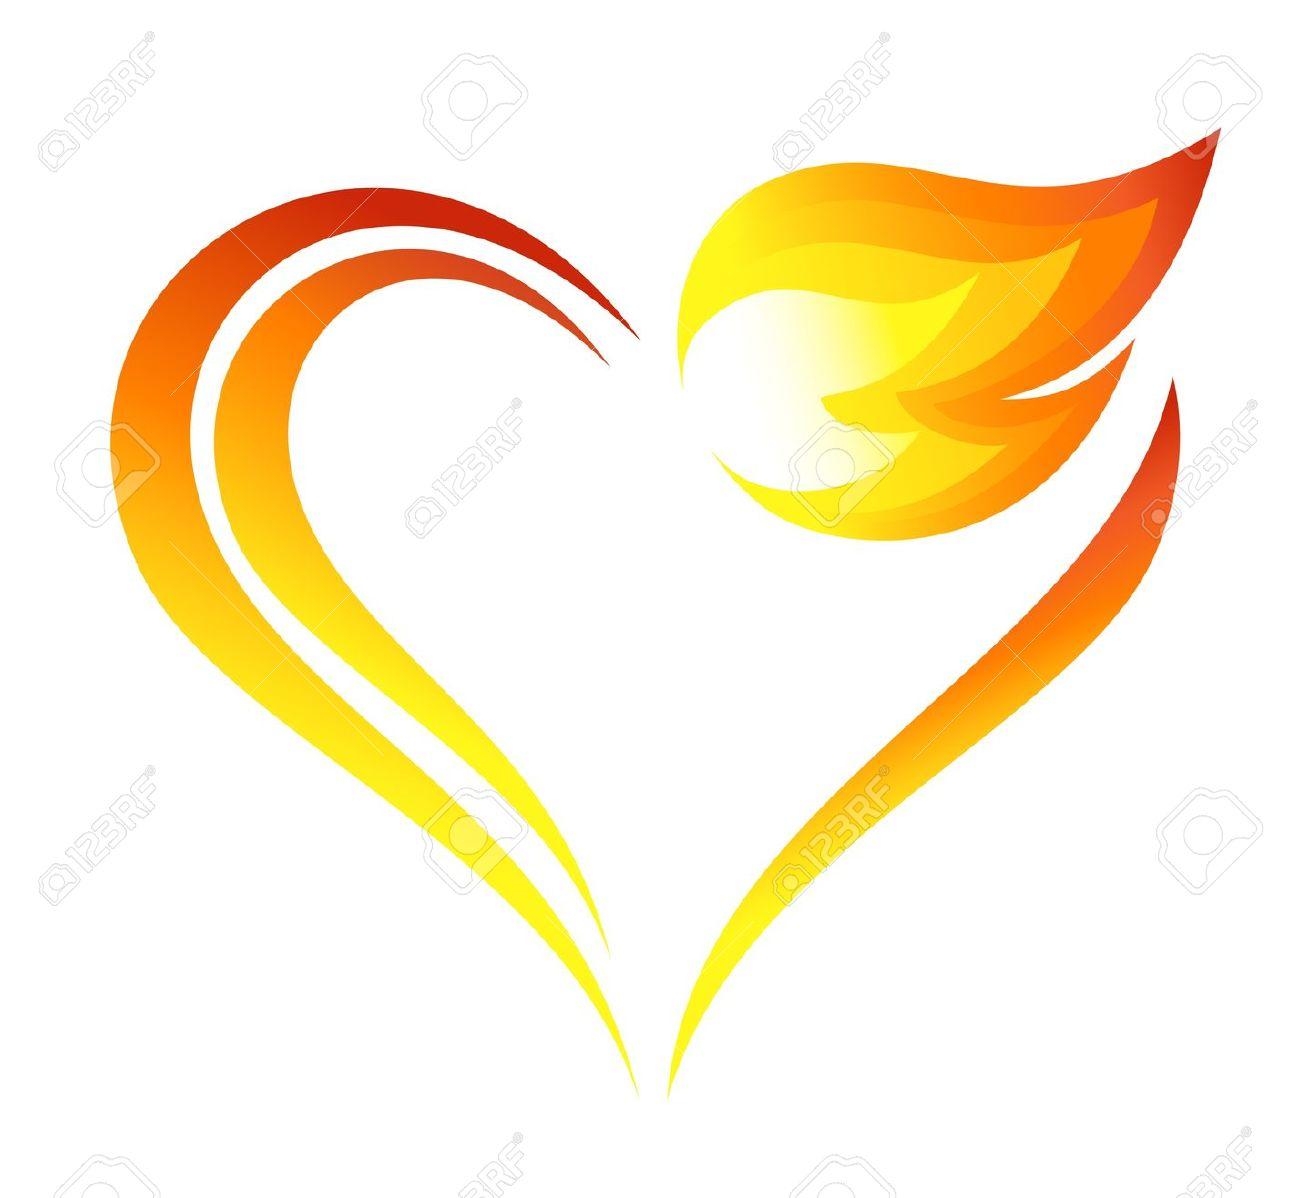 1300x1198 Flaming Heart Clipart